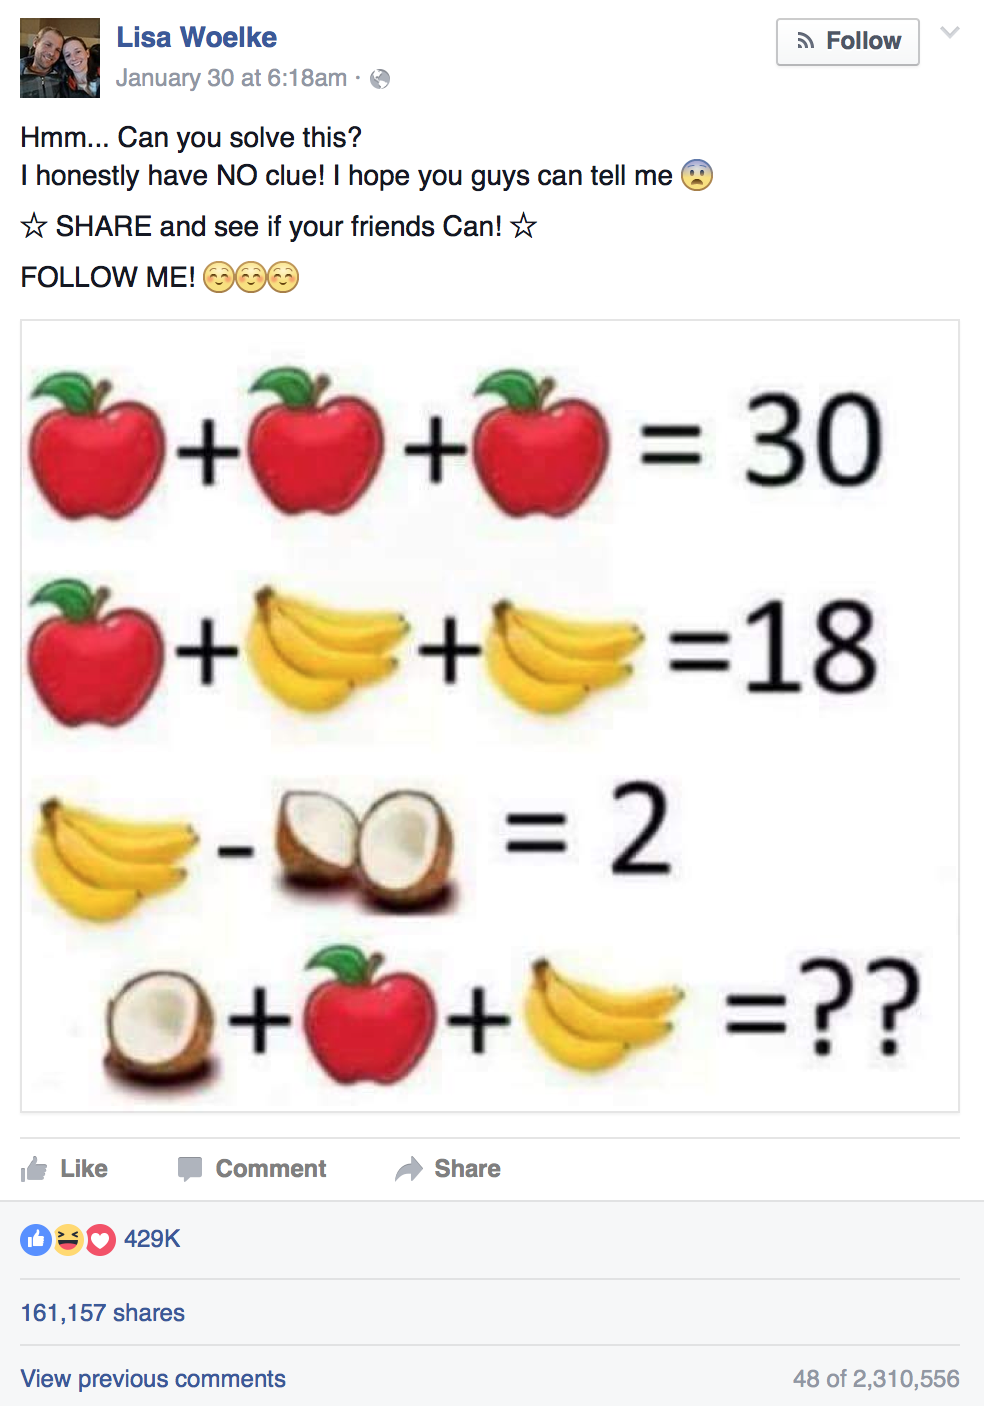 пример ребус картинка яблоко кокос и банан кажется, что уборщицы